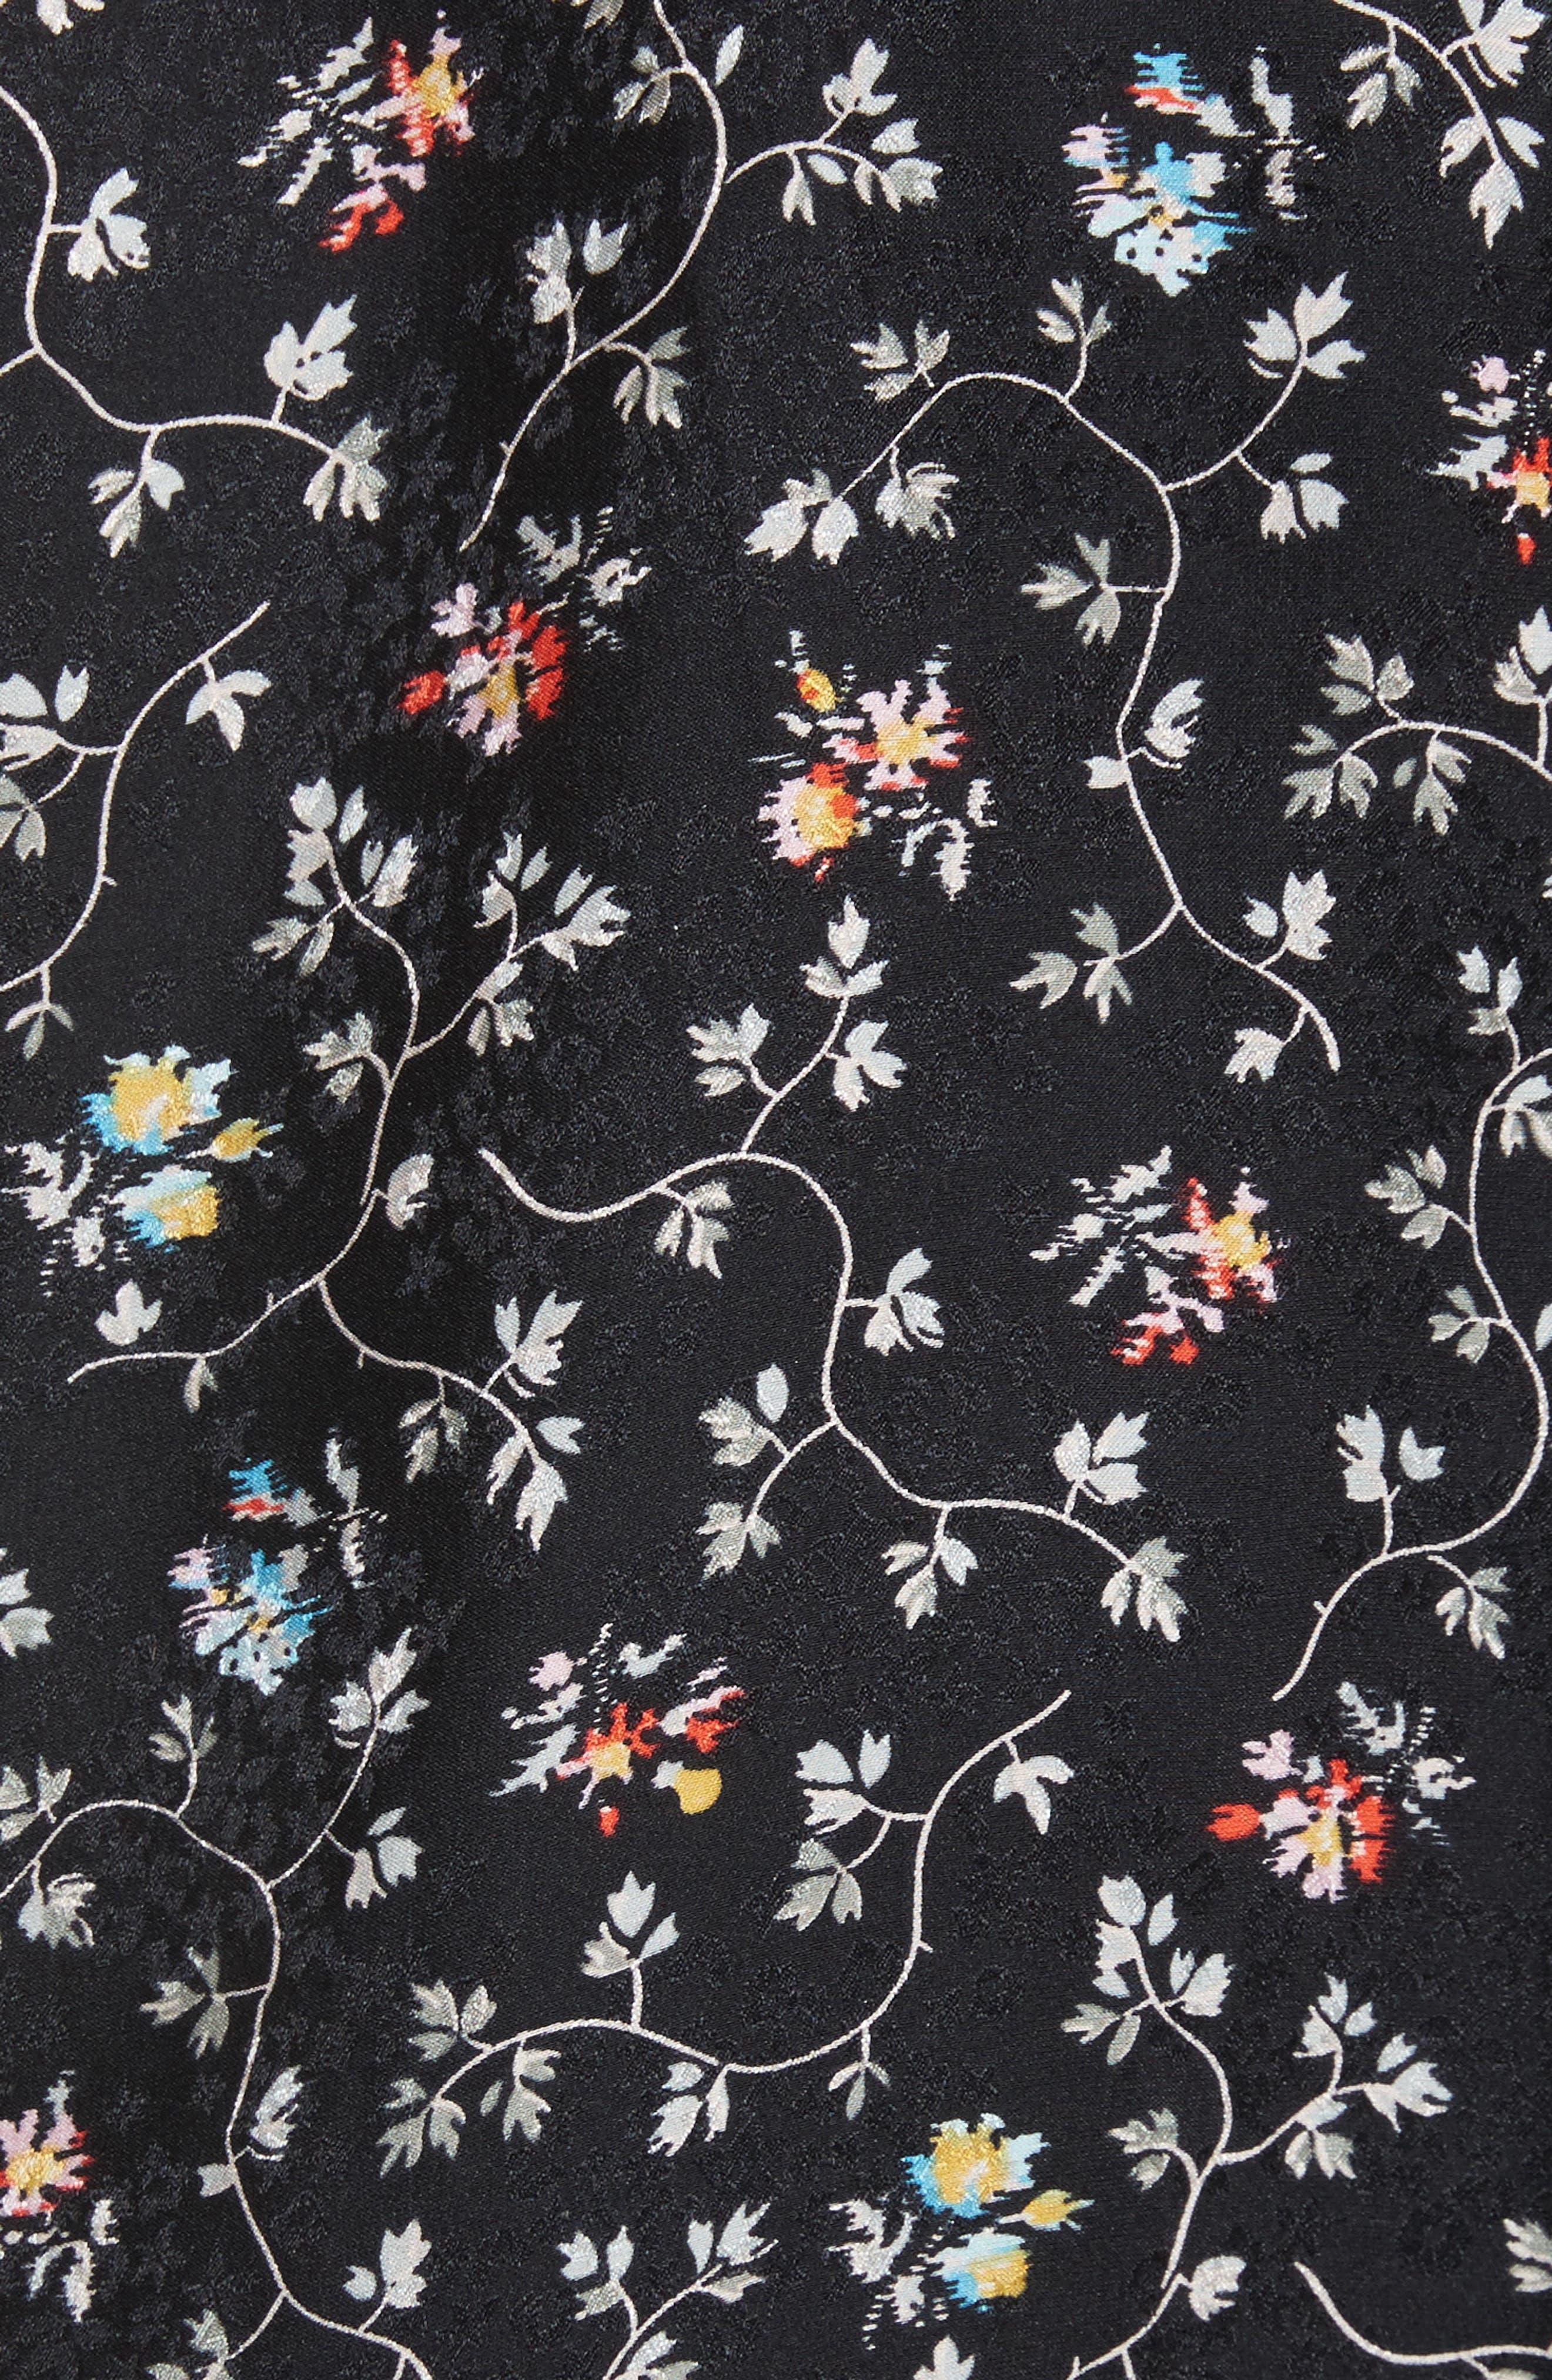 Floral Print Ruffle Silk Top,                             Alternate thumbnail 5, color,                             001